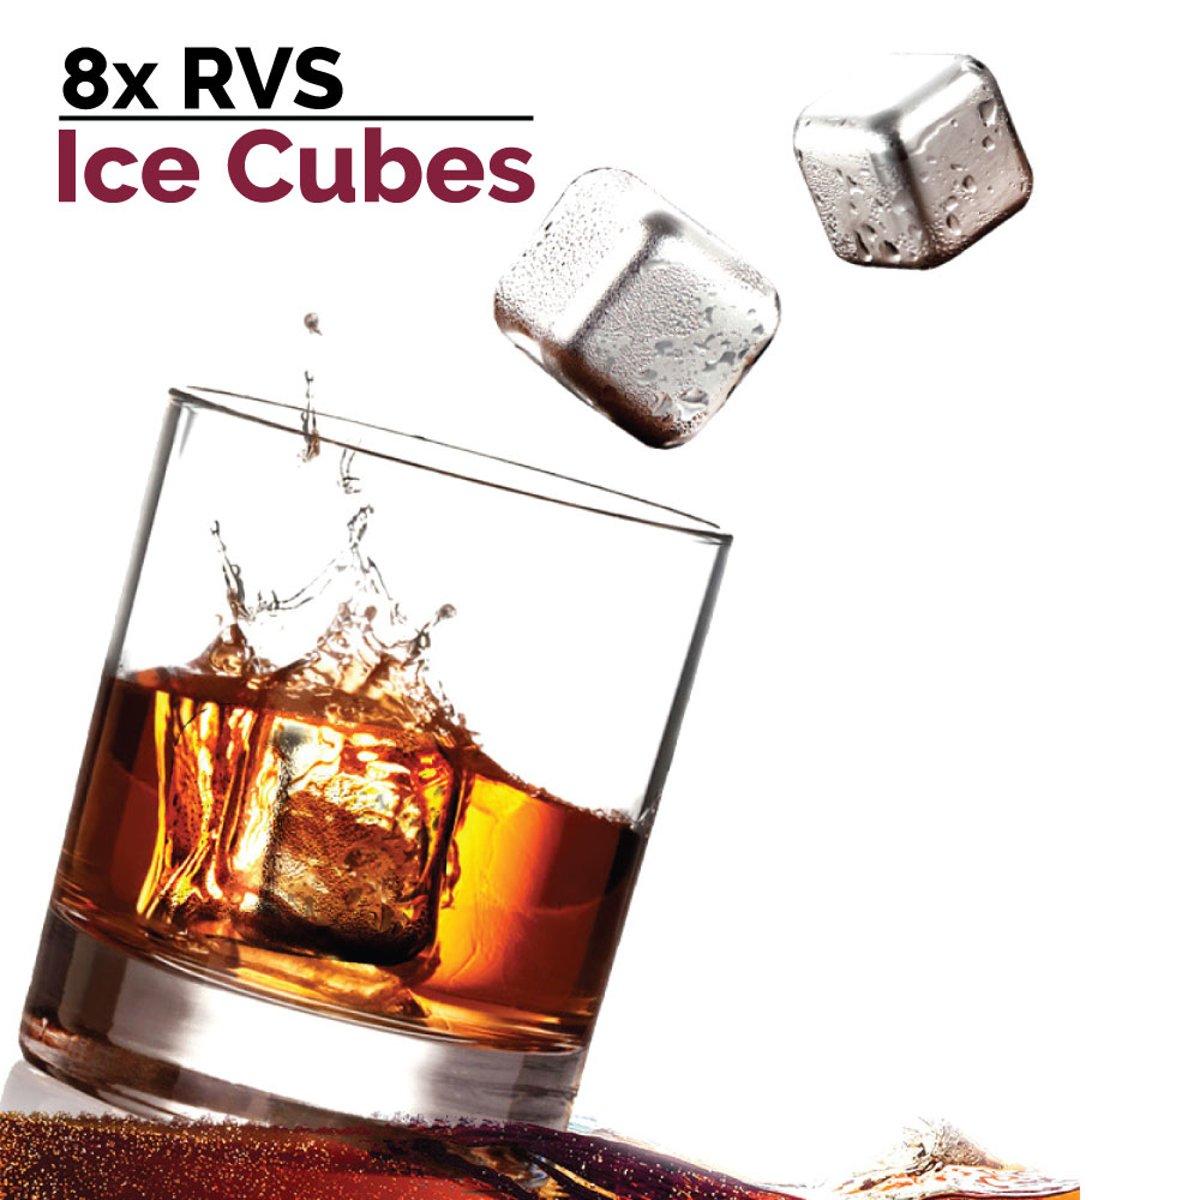 Ice Cubes ijsblokjes - RVS - Gift set van 8 Ice Cubes + Tang kopen